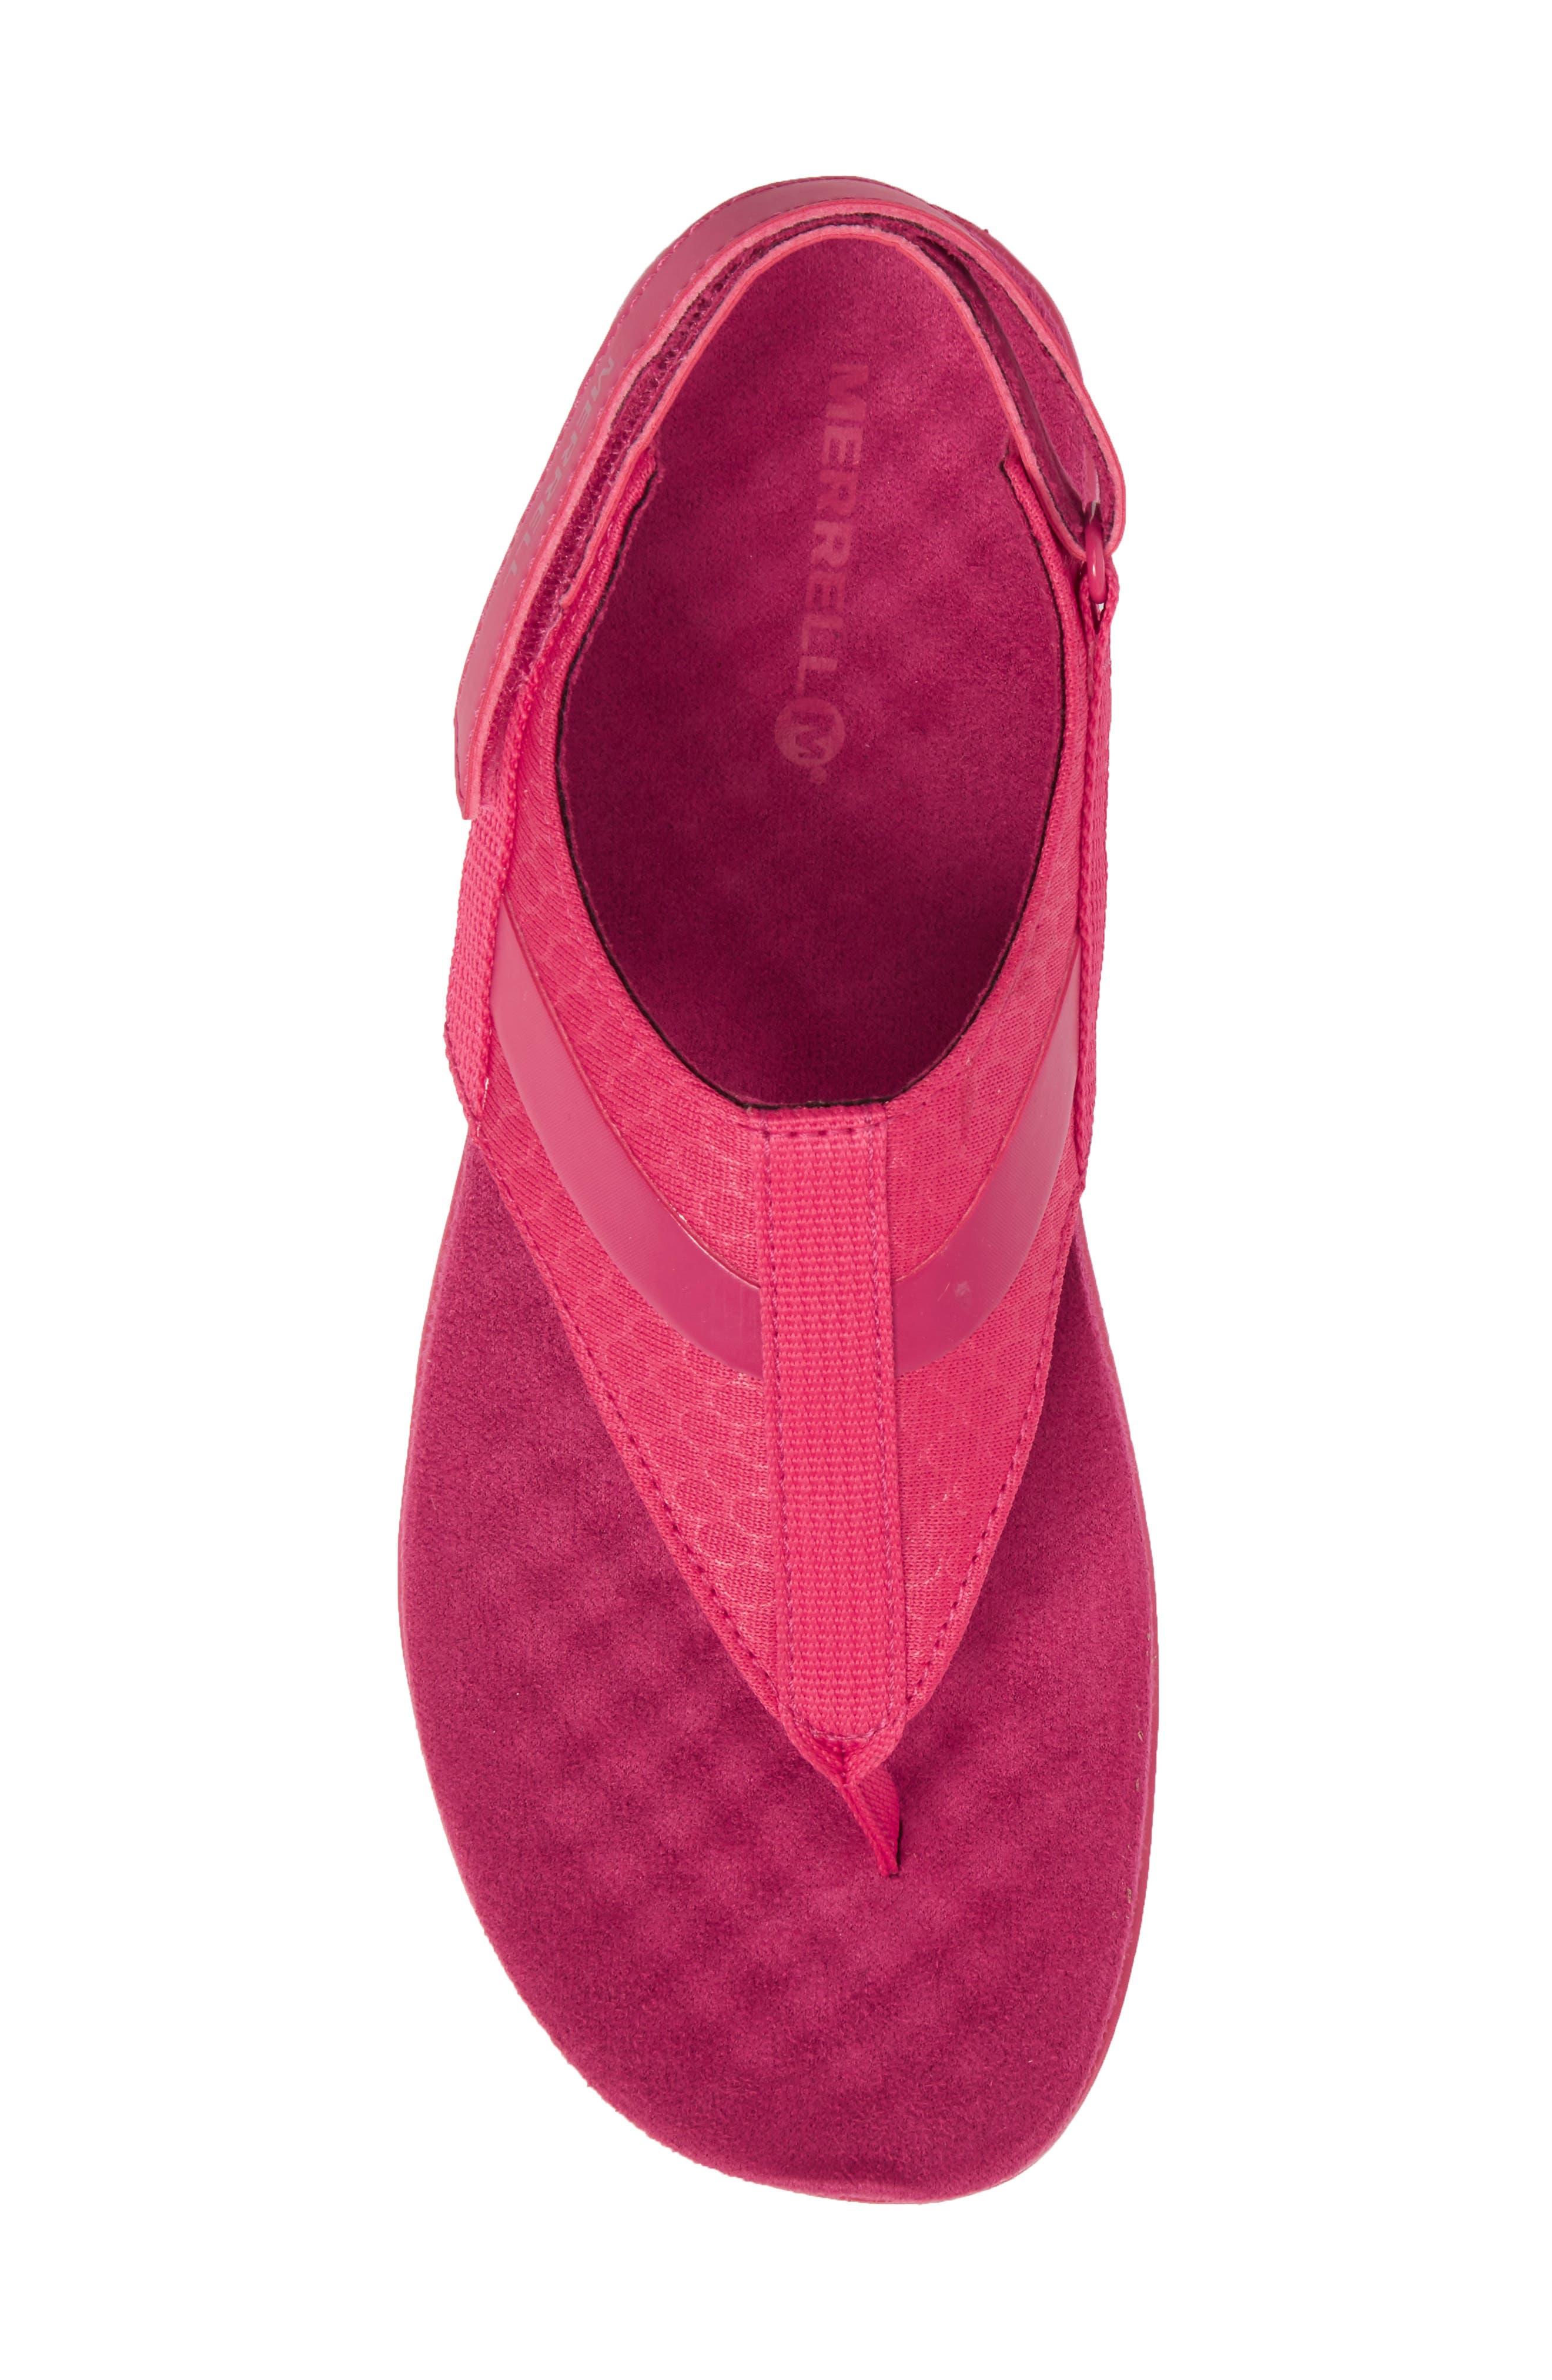 1SIX8 Linna Slide Air Cushion+ Sandal,                             Alternate thumbnail 20, color,